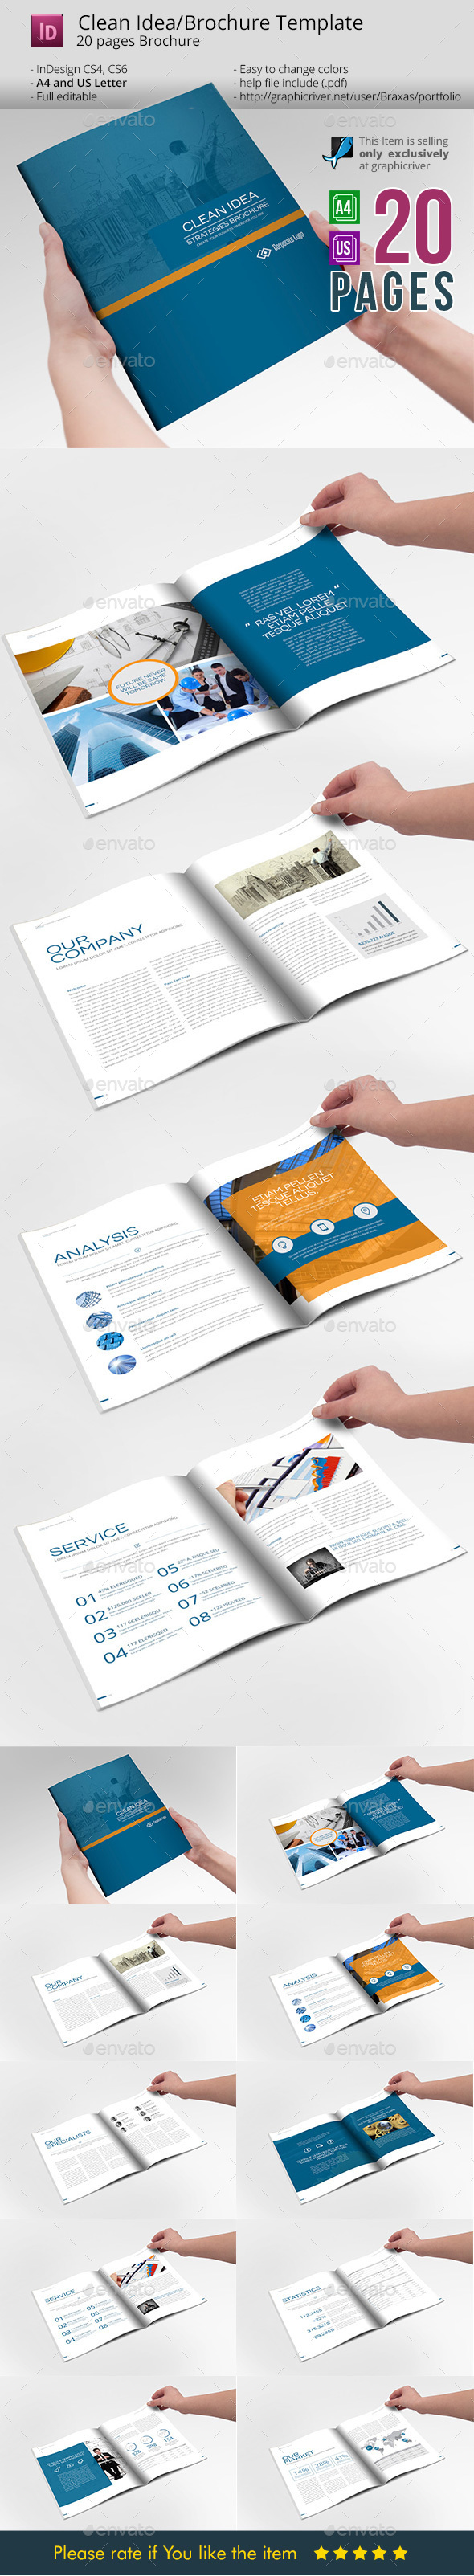 Clean Idea _ InDesign Busines Brochure Template - Informational Brochures